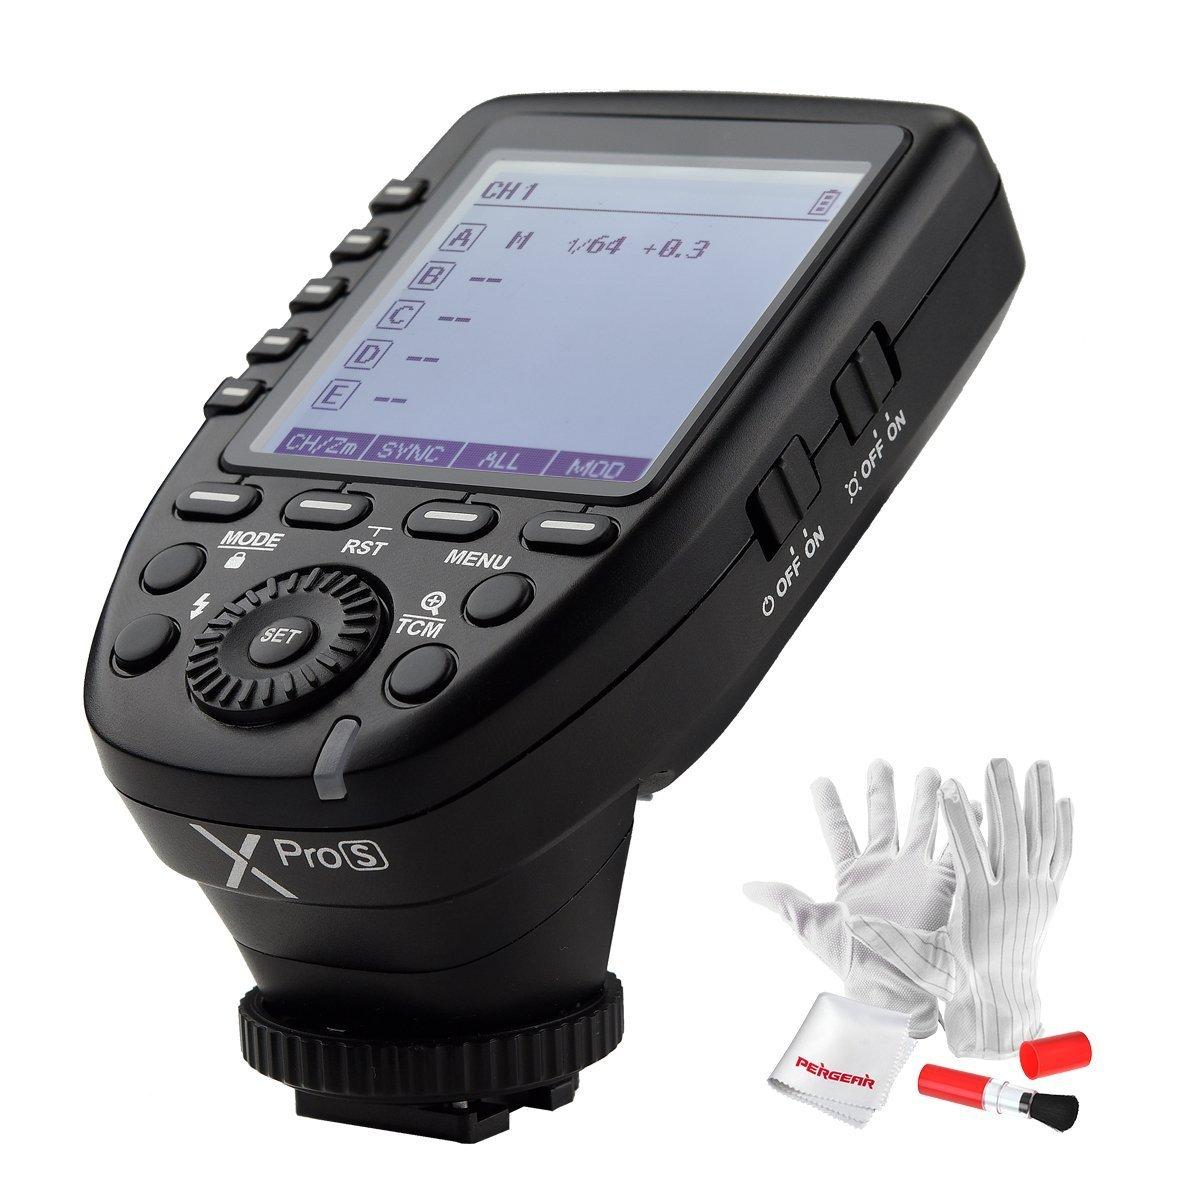 【PDF日本語説明書&正規品】GODOX Xpro-S送信機 TTL2.4Gワイヤレスフラッシュトリガー 高速同期 1 / 8000s Xシステム Sony一眼レフカメラ対応 技適マーク付き